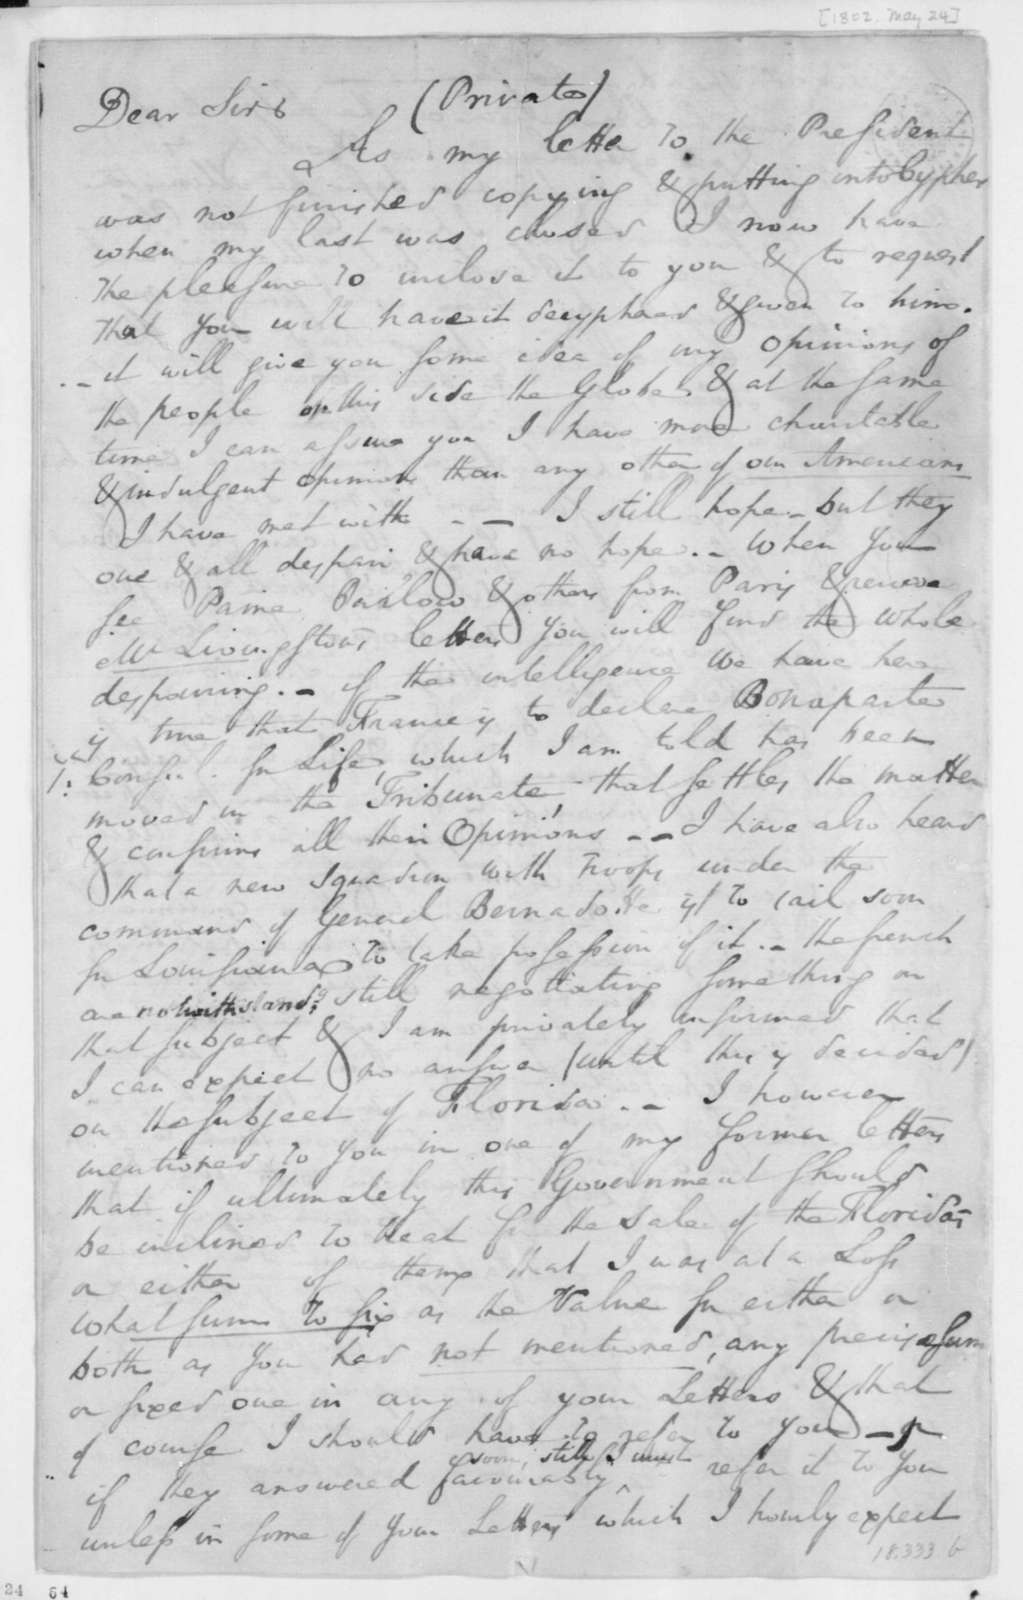 Charles Pinckney to James Madison, May 24, 1802.